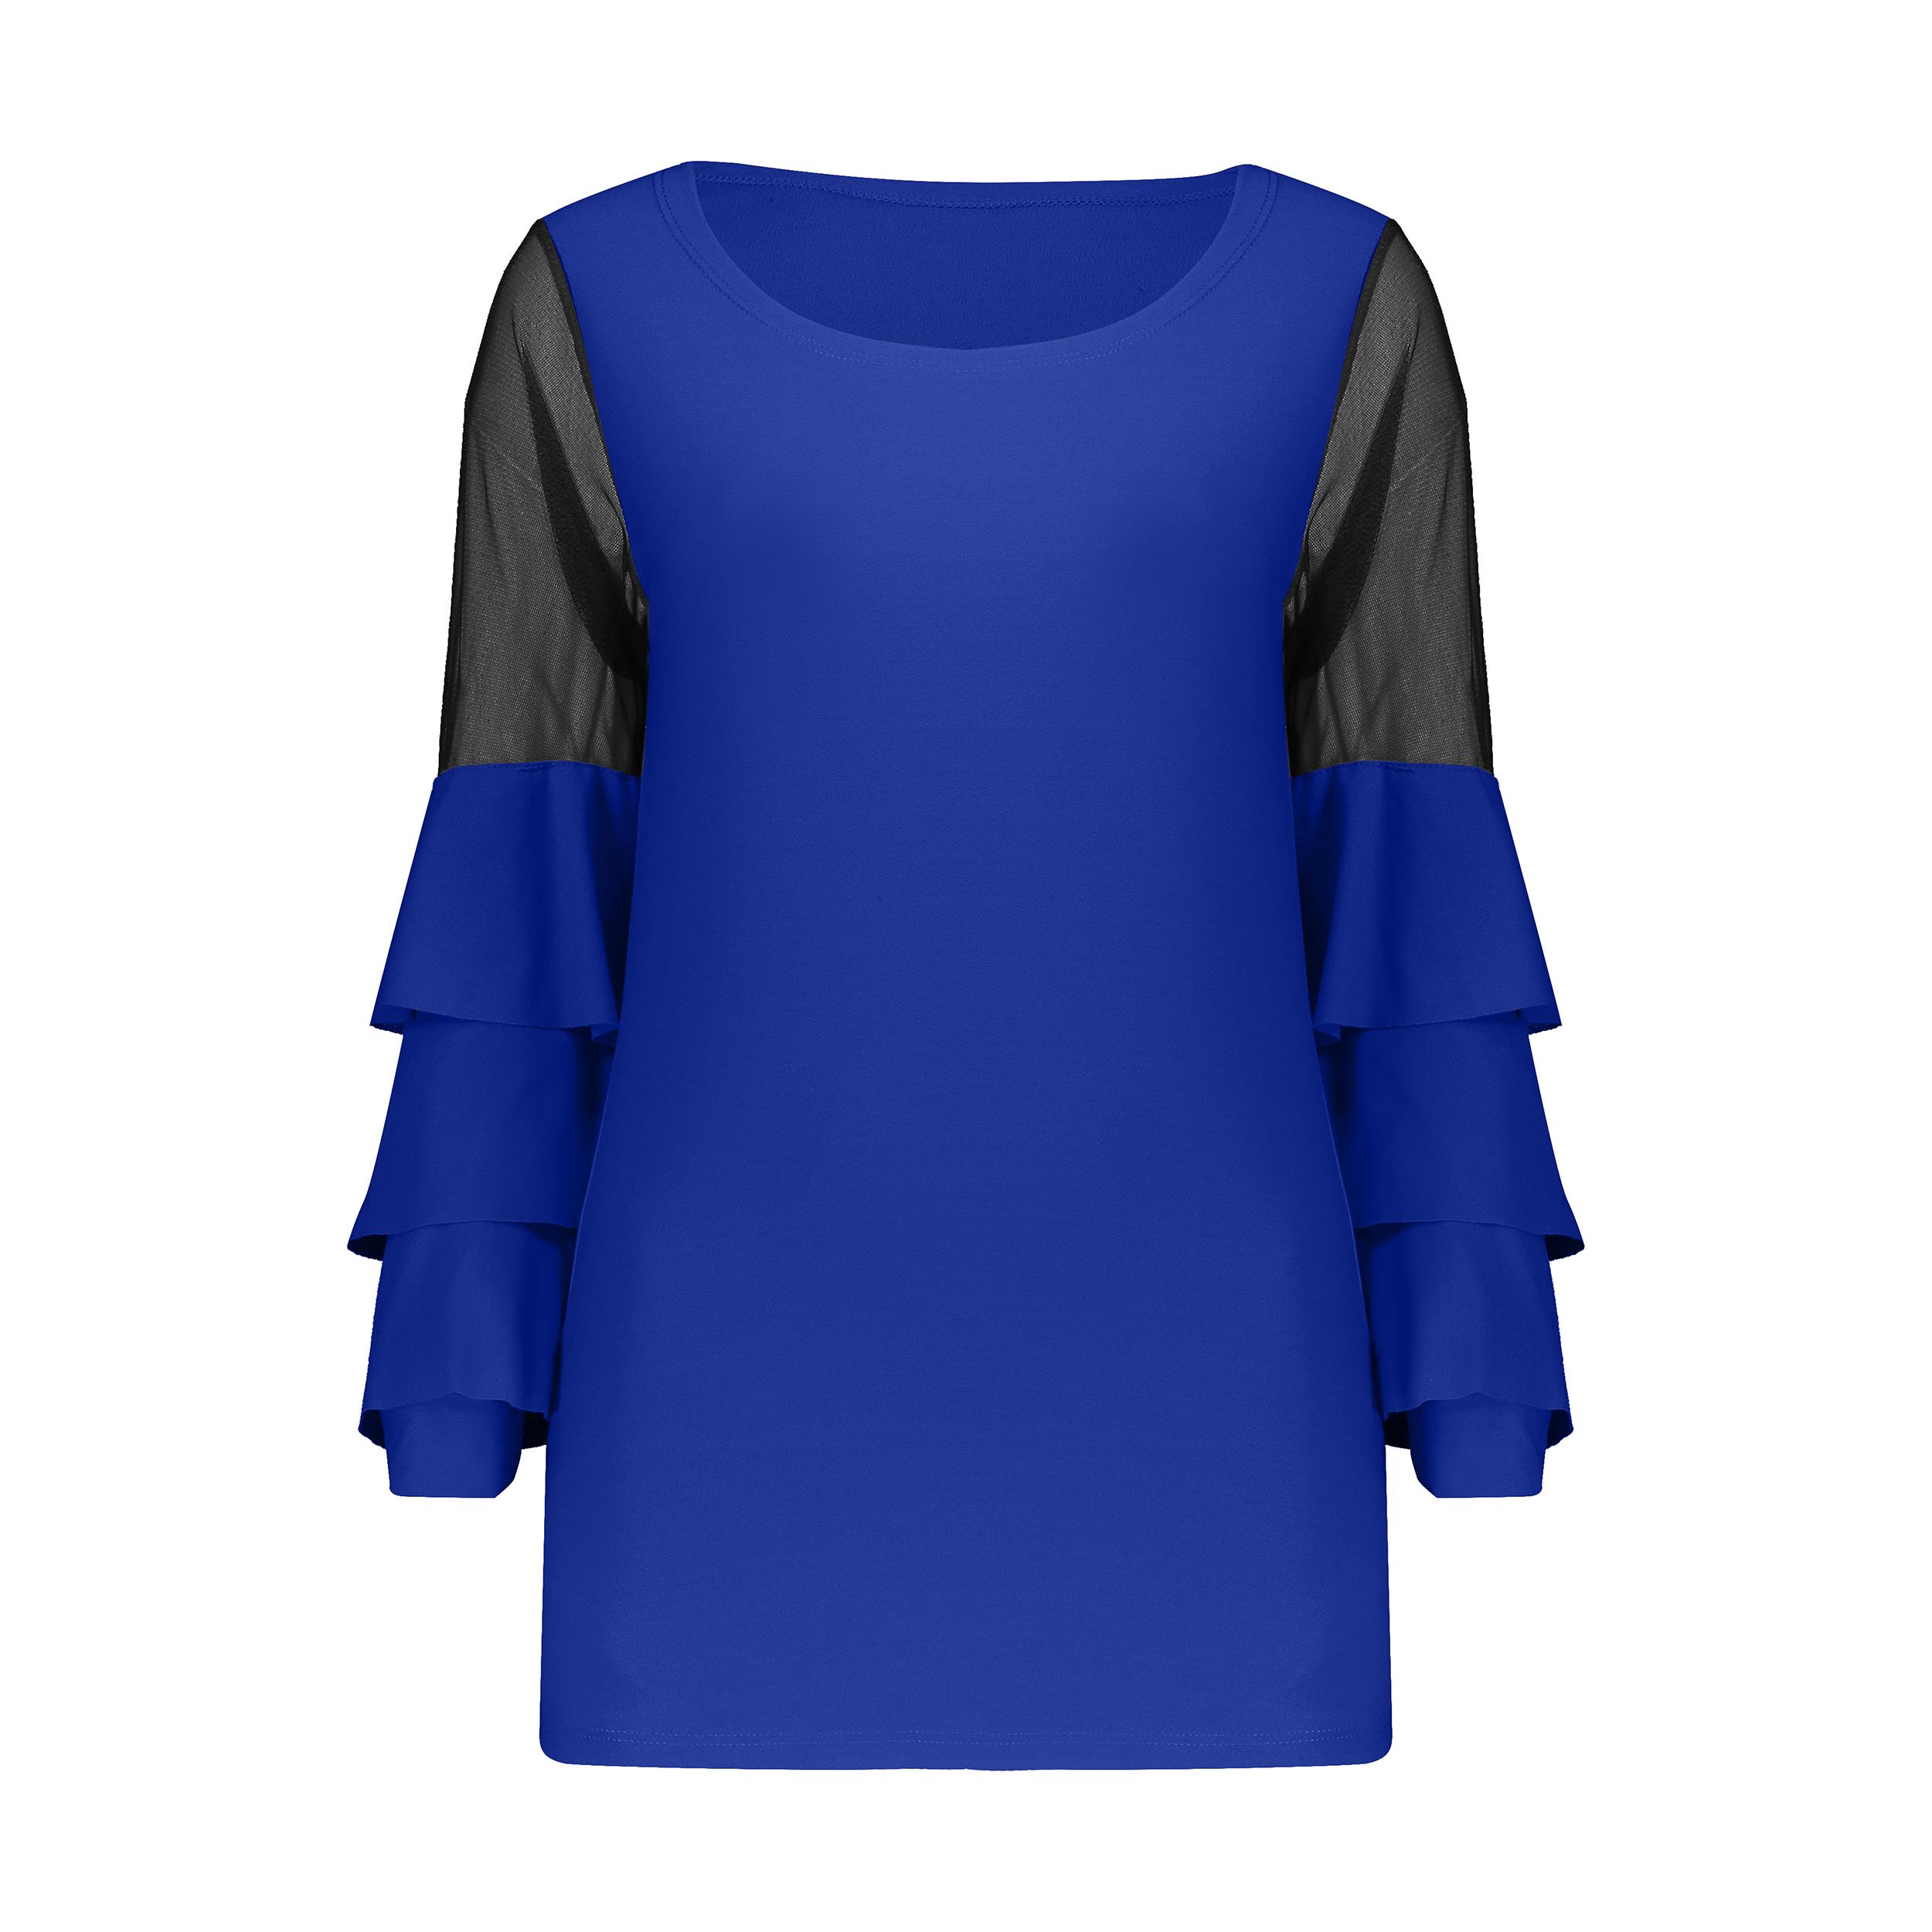 بلوز زنانه مدل 705 رنگ آبی